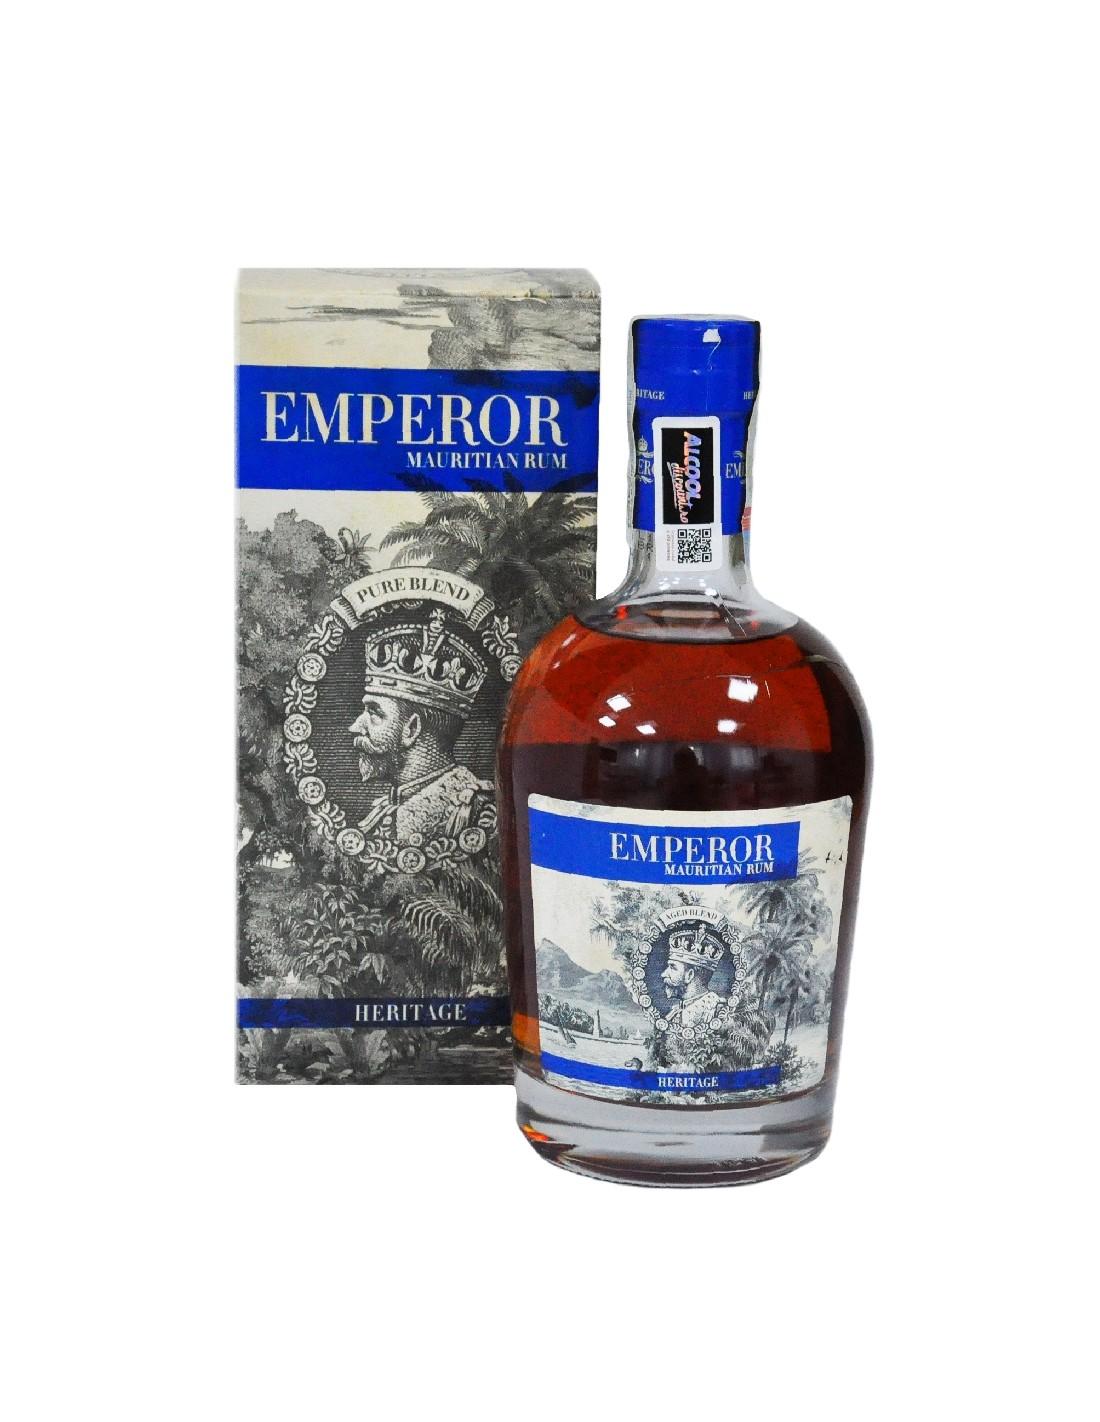 Rom Emperor Mauritian Heritage + GB, 40%, 0.7L